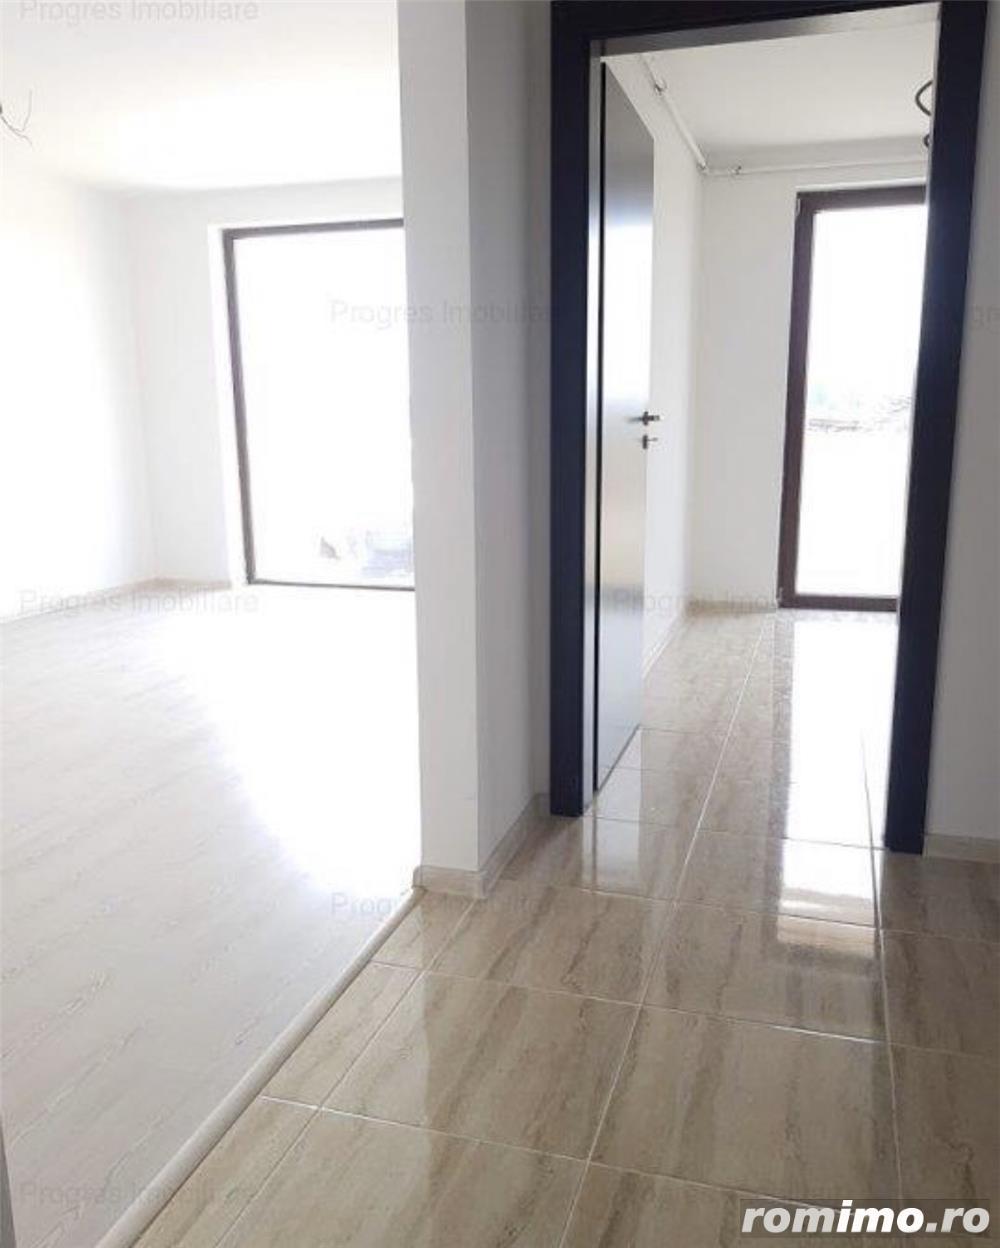 Ap. 3 camere decomandat-bloc finalizat-75.000 euro, Braytim